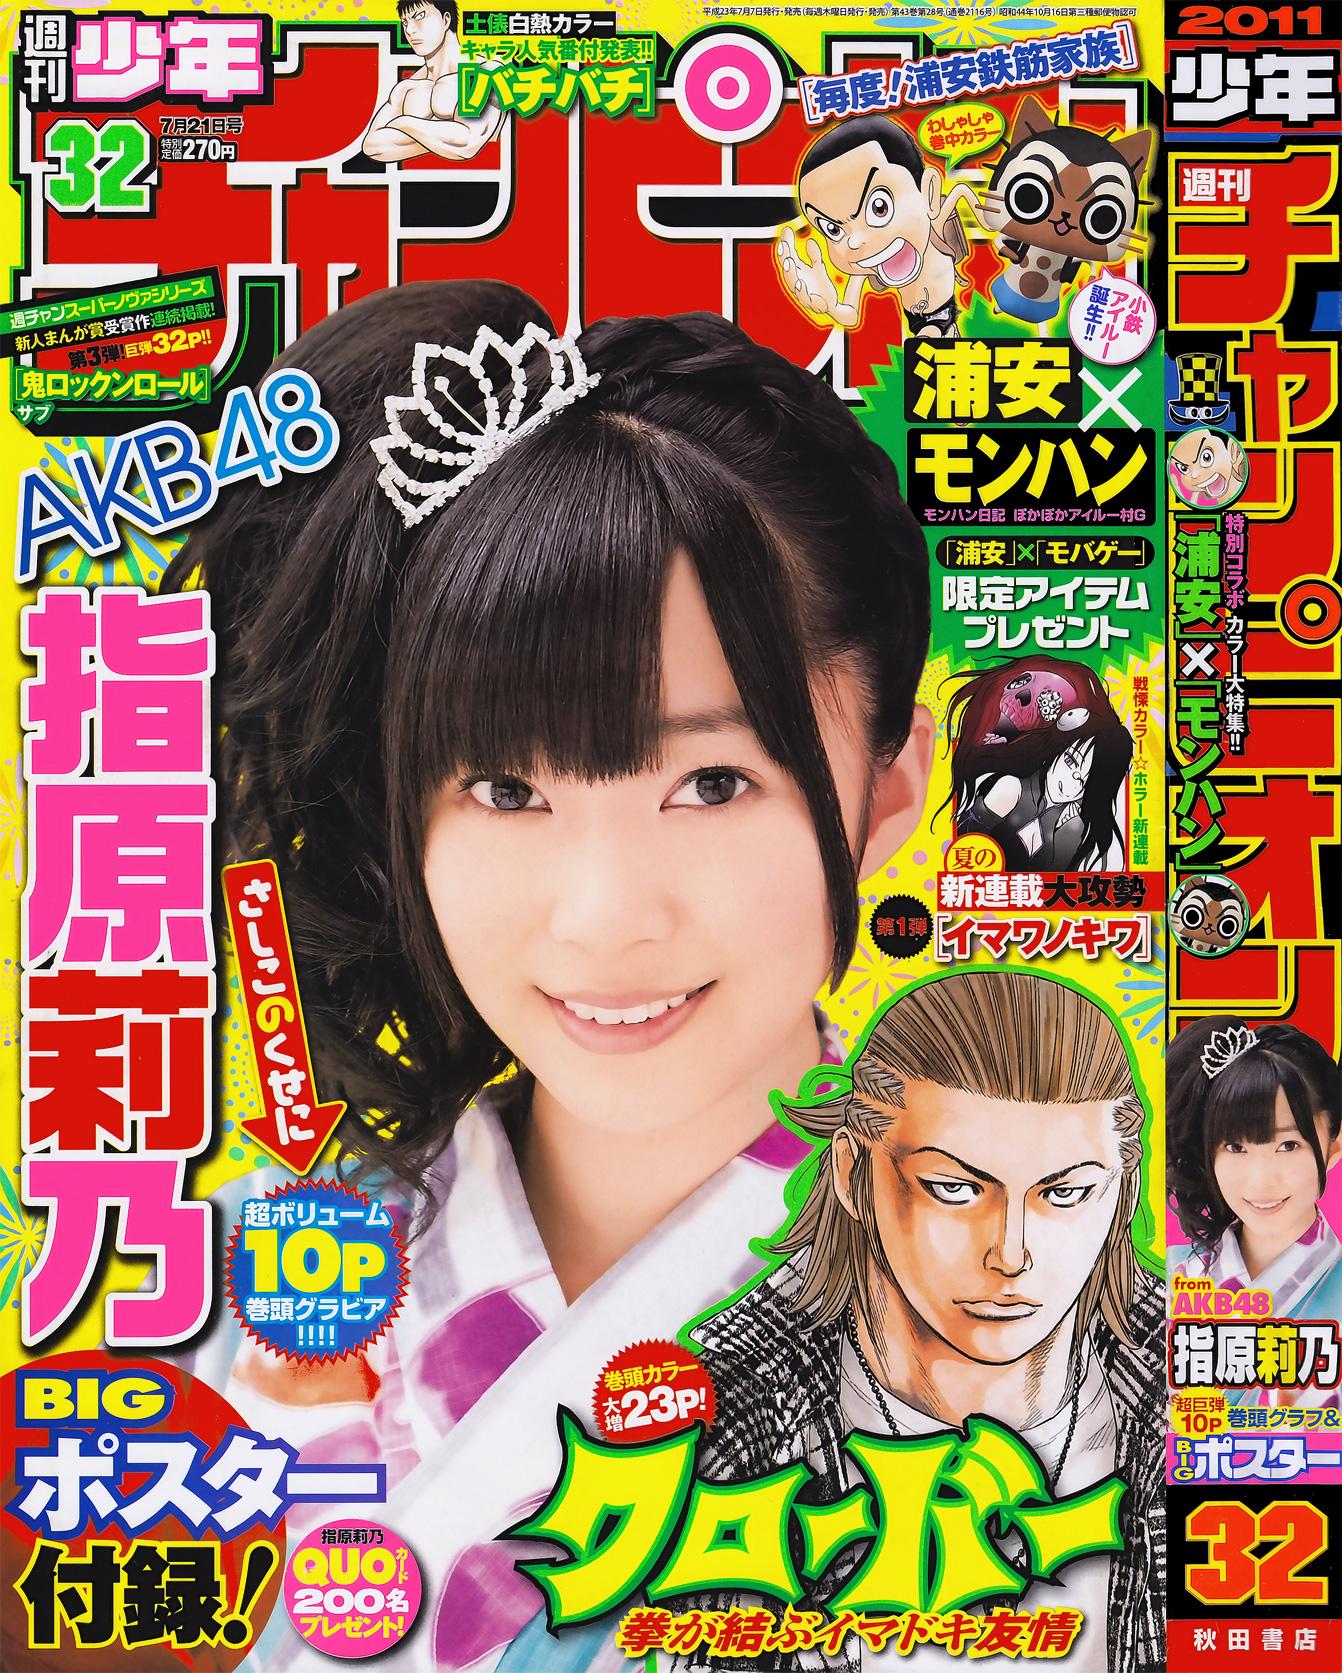 [Shonen Champion] 2011 No.32 Rino Sashihara 指原莉乃 [11P9MB] sexy girls image jav